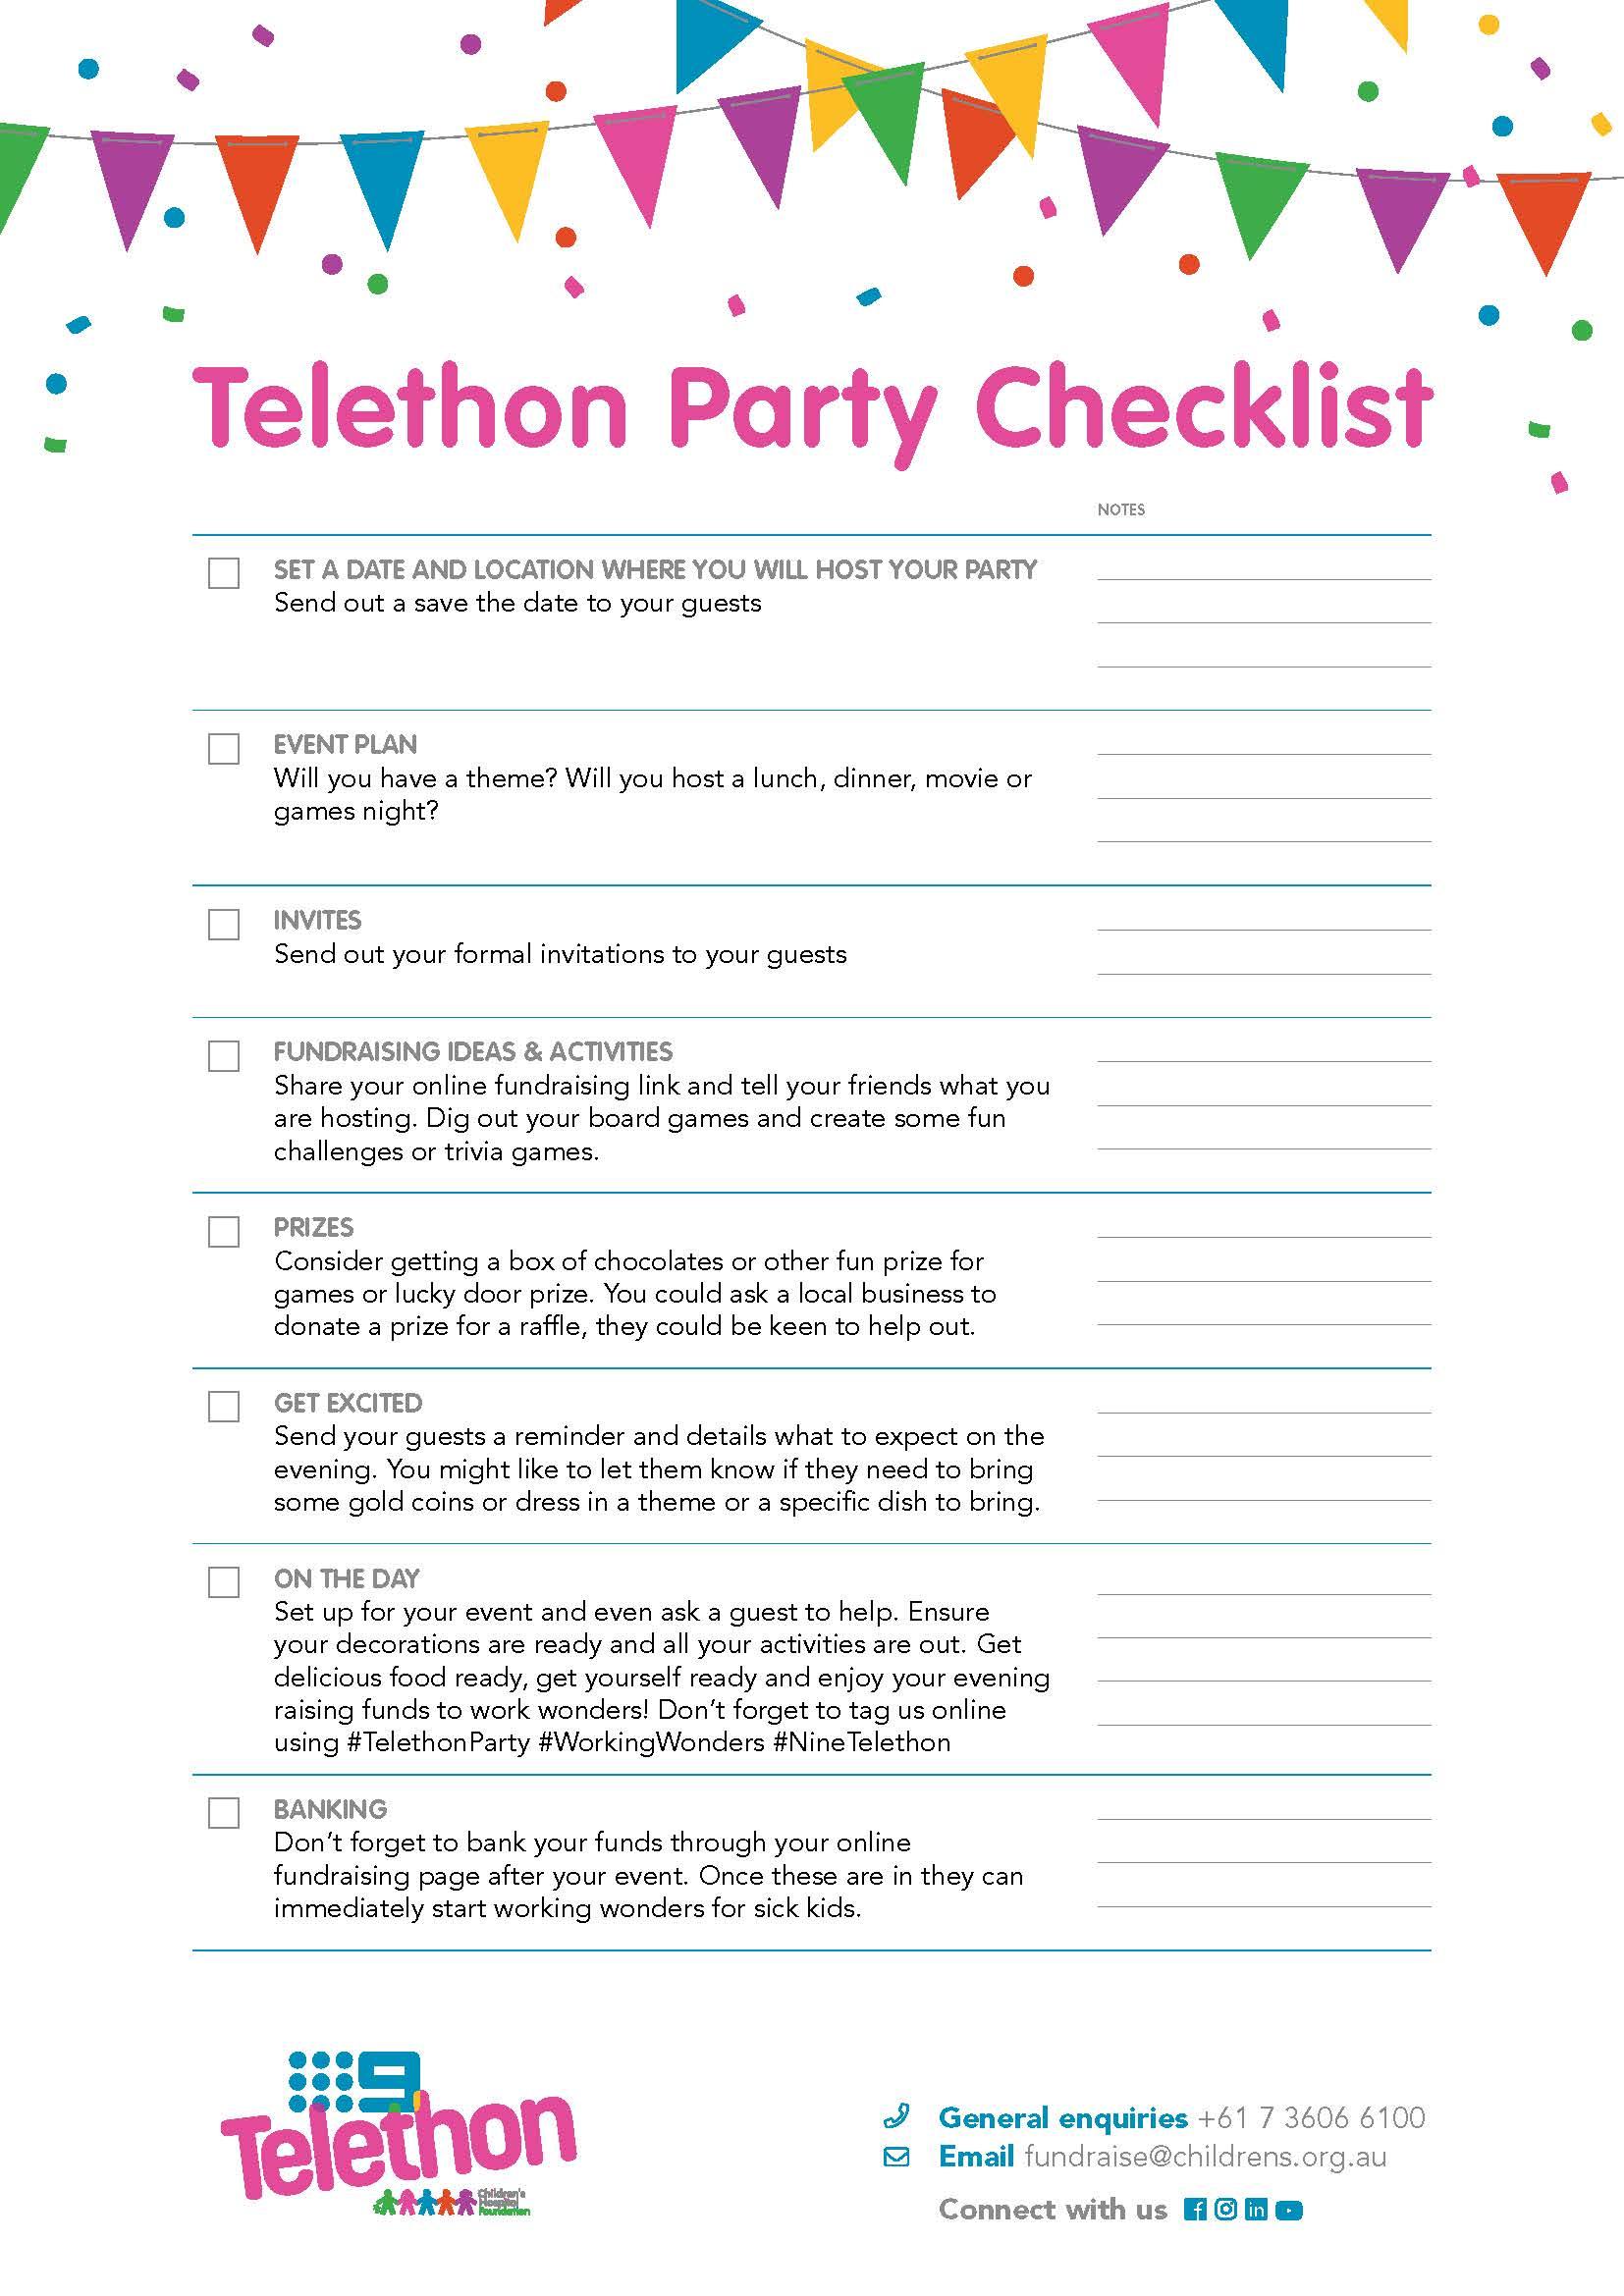 Telethon Party Checklist